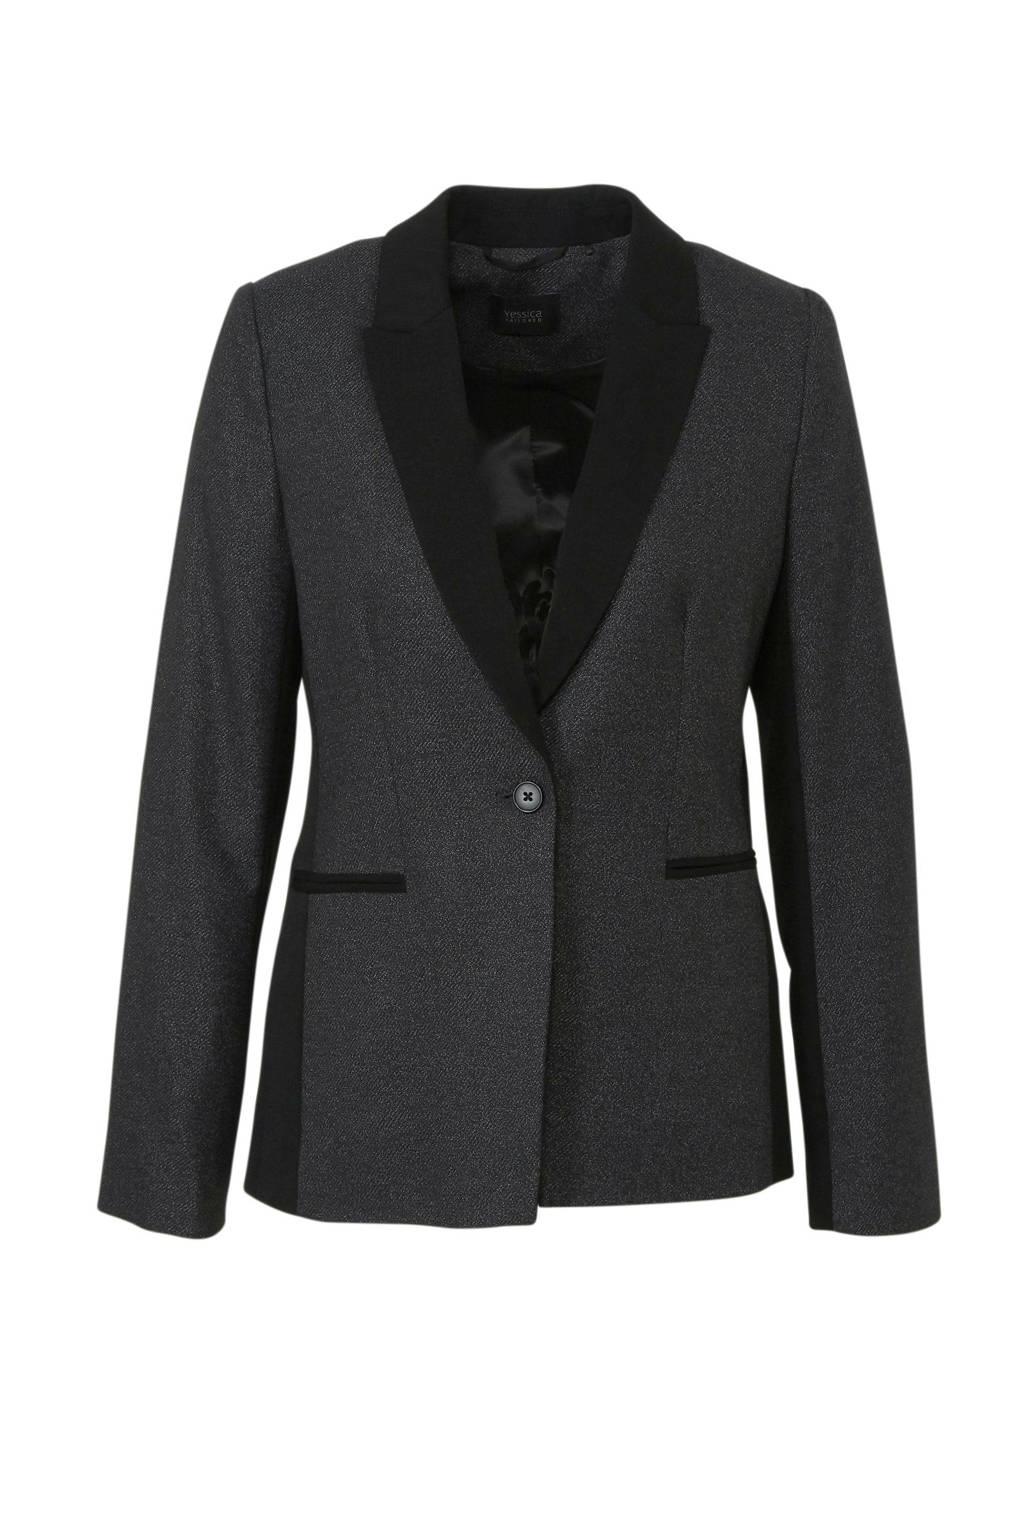 C&A blazer zwart, Zwart